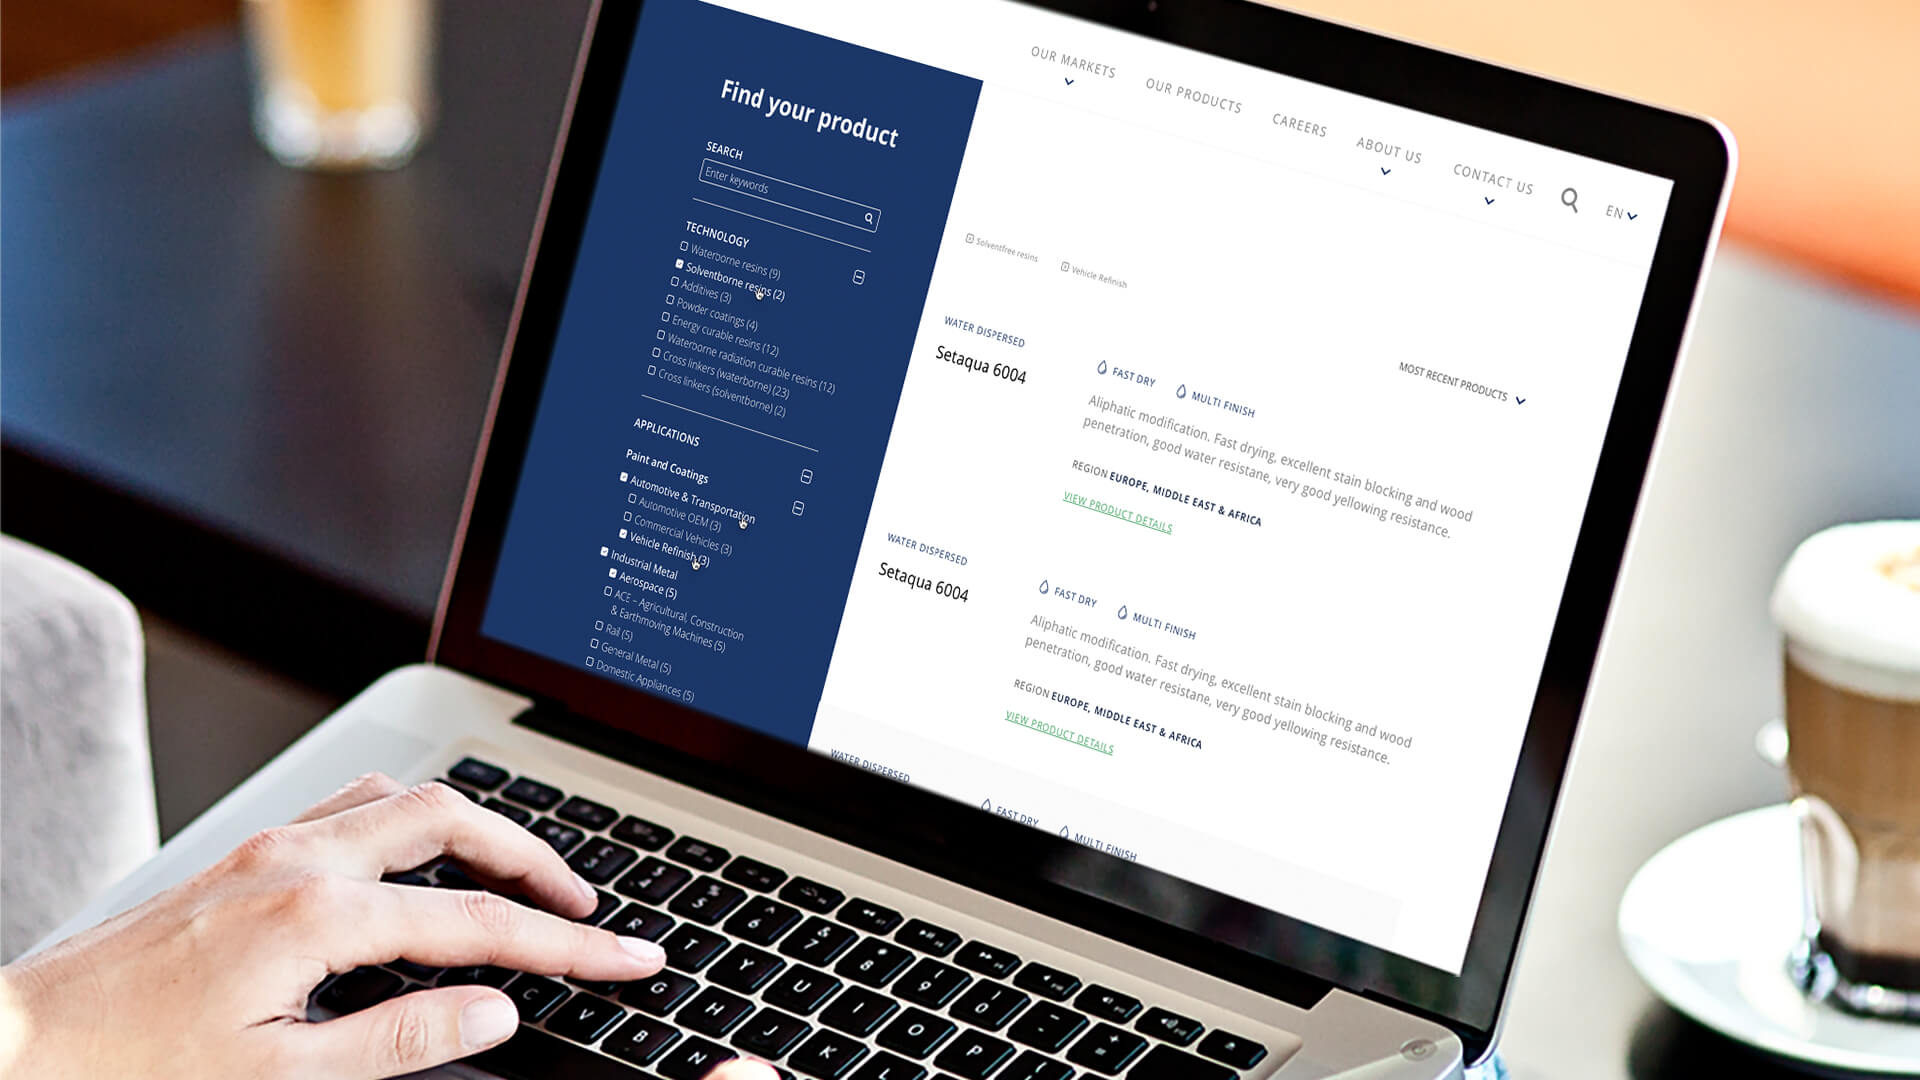 Allnex website - Find your product screen